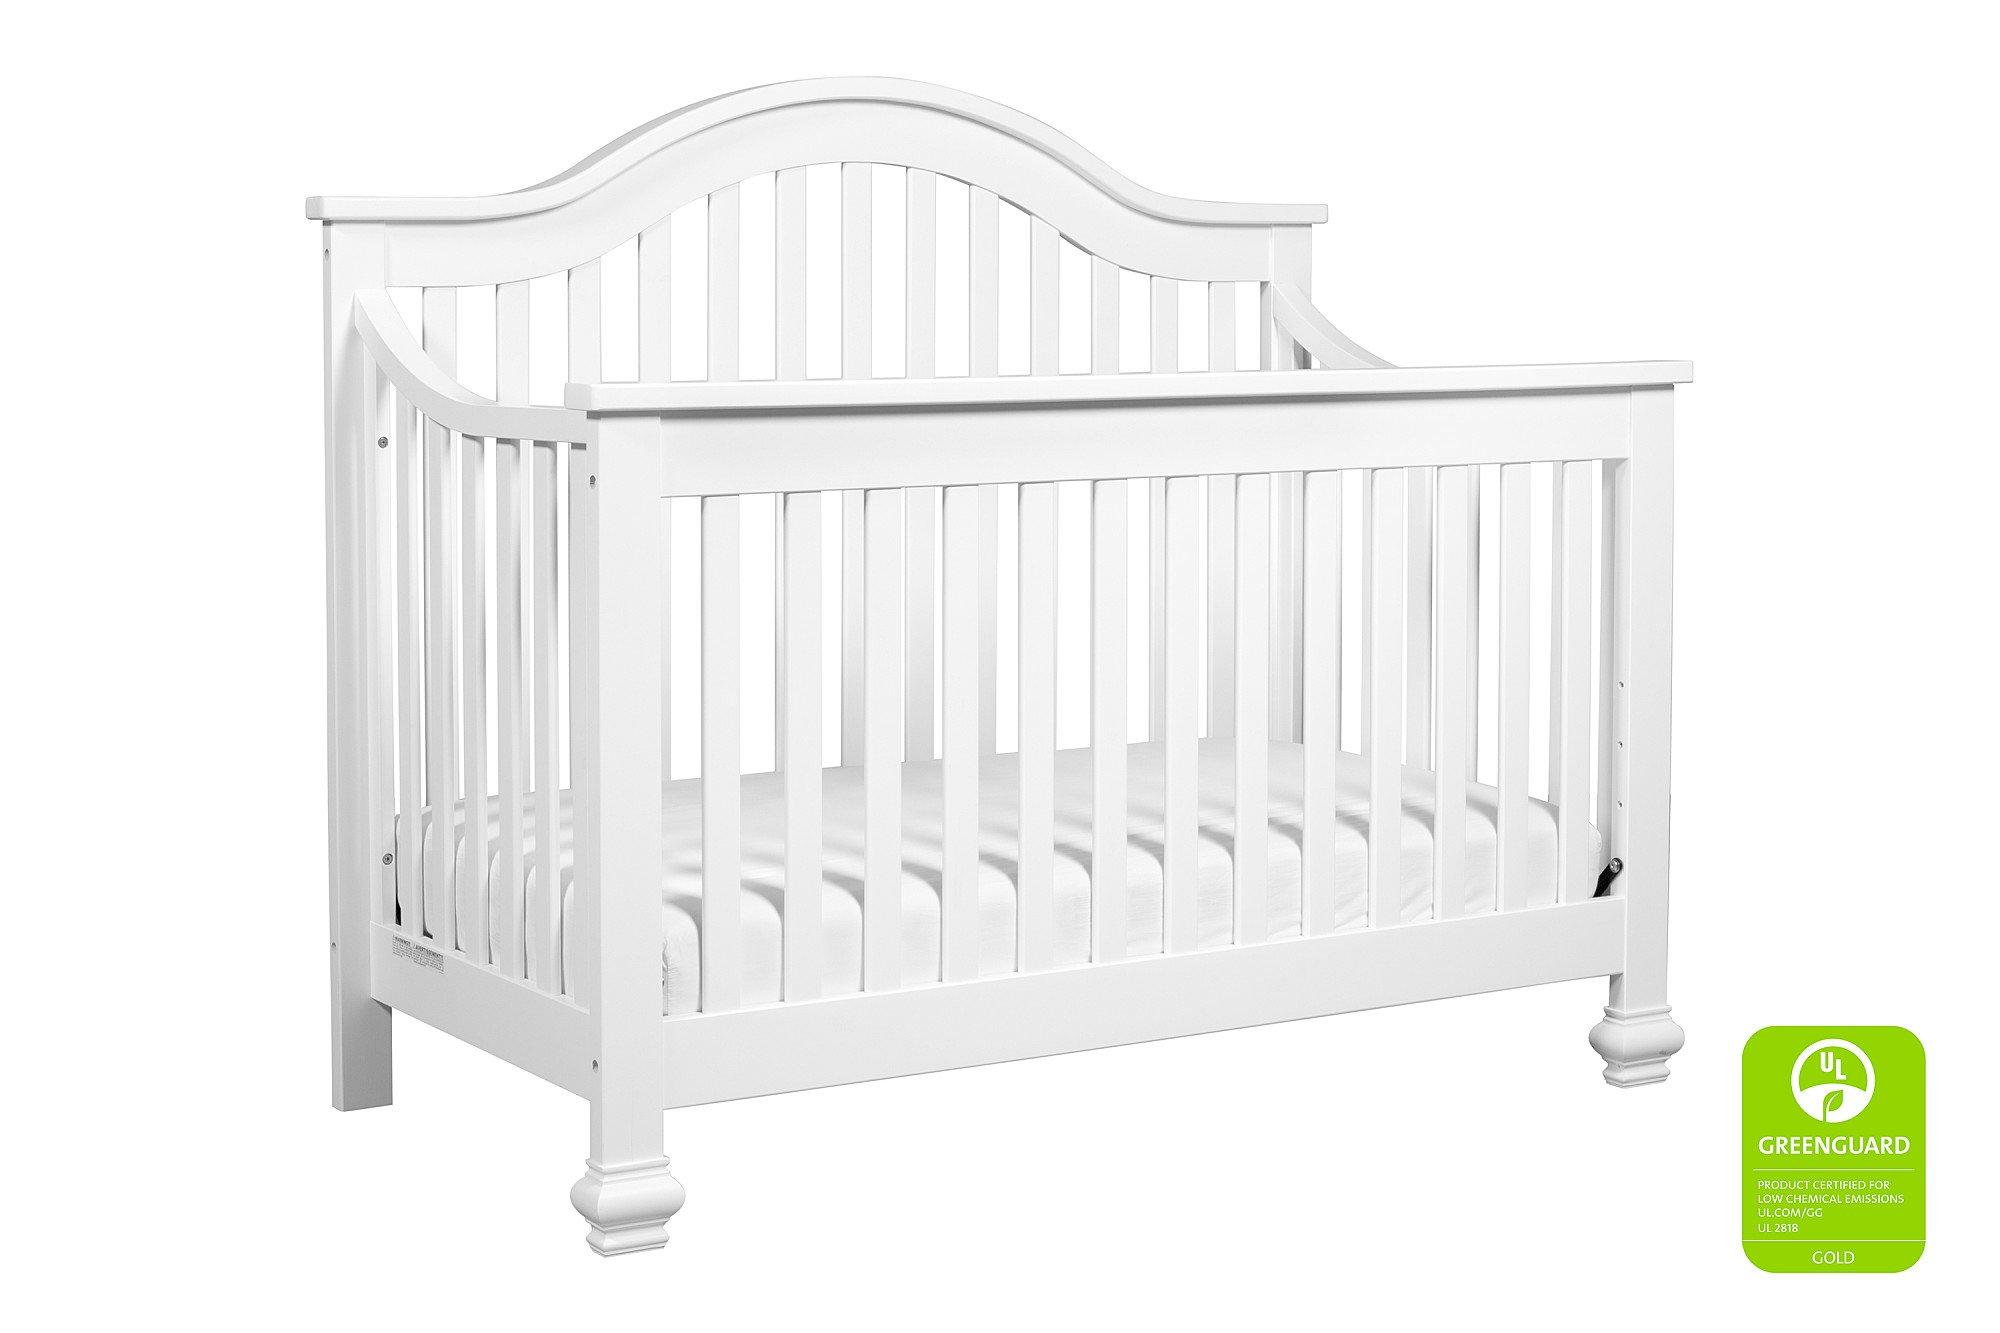 Davinci Clover 4-in-1 Crib Full Size Conversion Kit Bed Rails - White